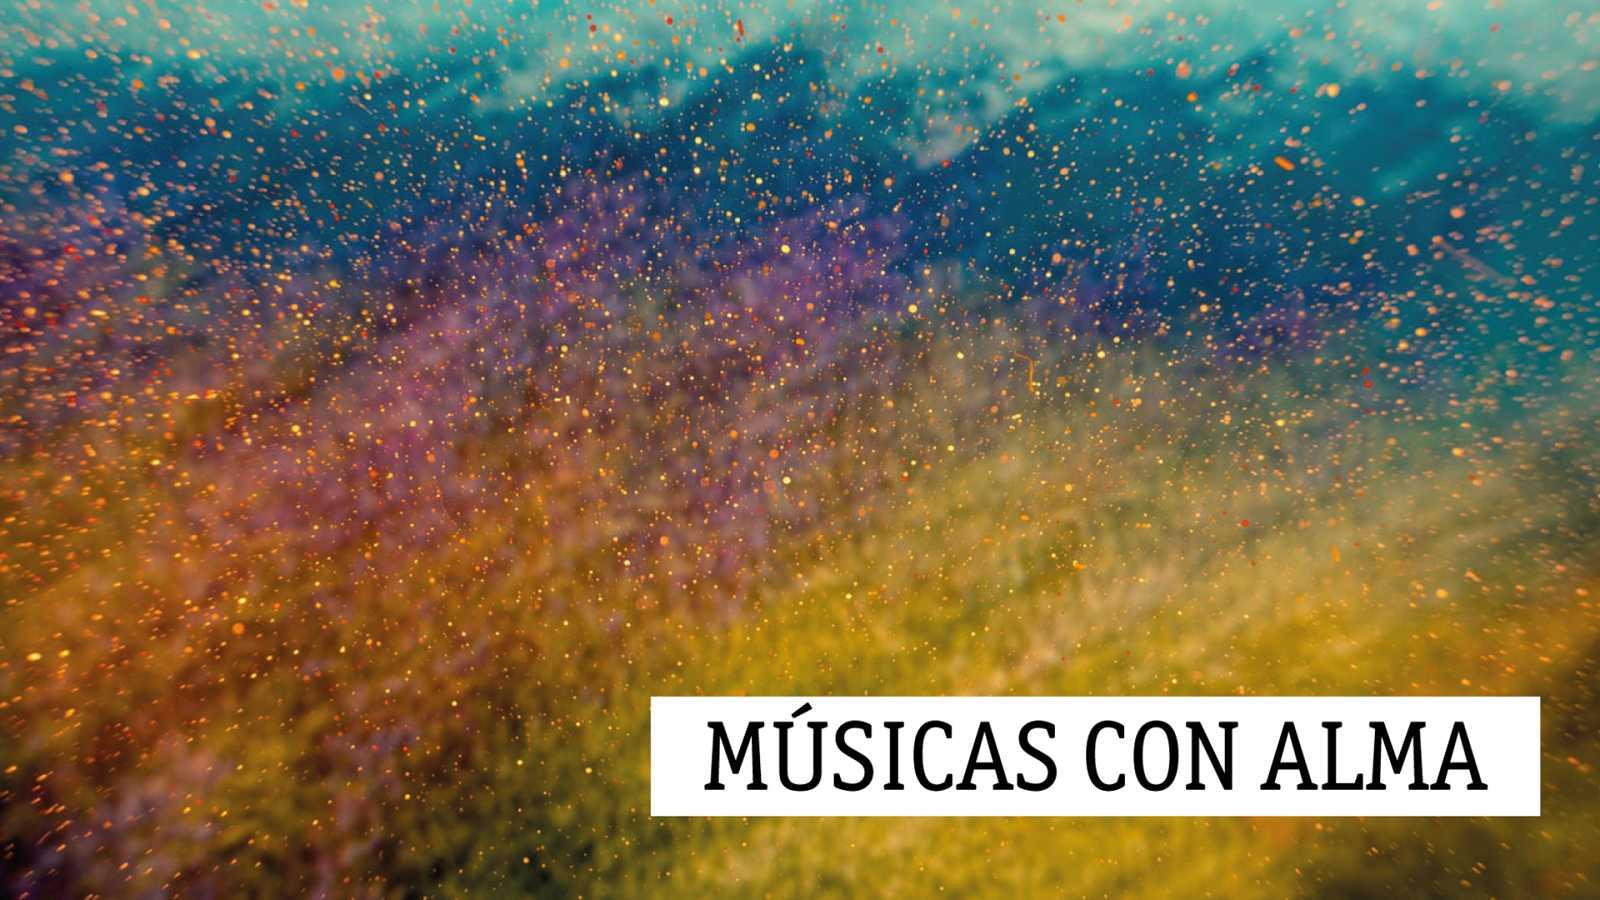 Músicas con alma - Misión - 26/02/21 - escuchar ahora